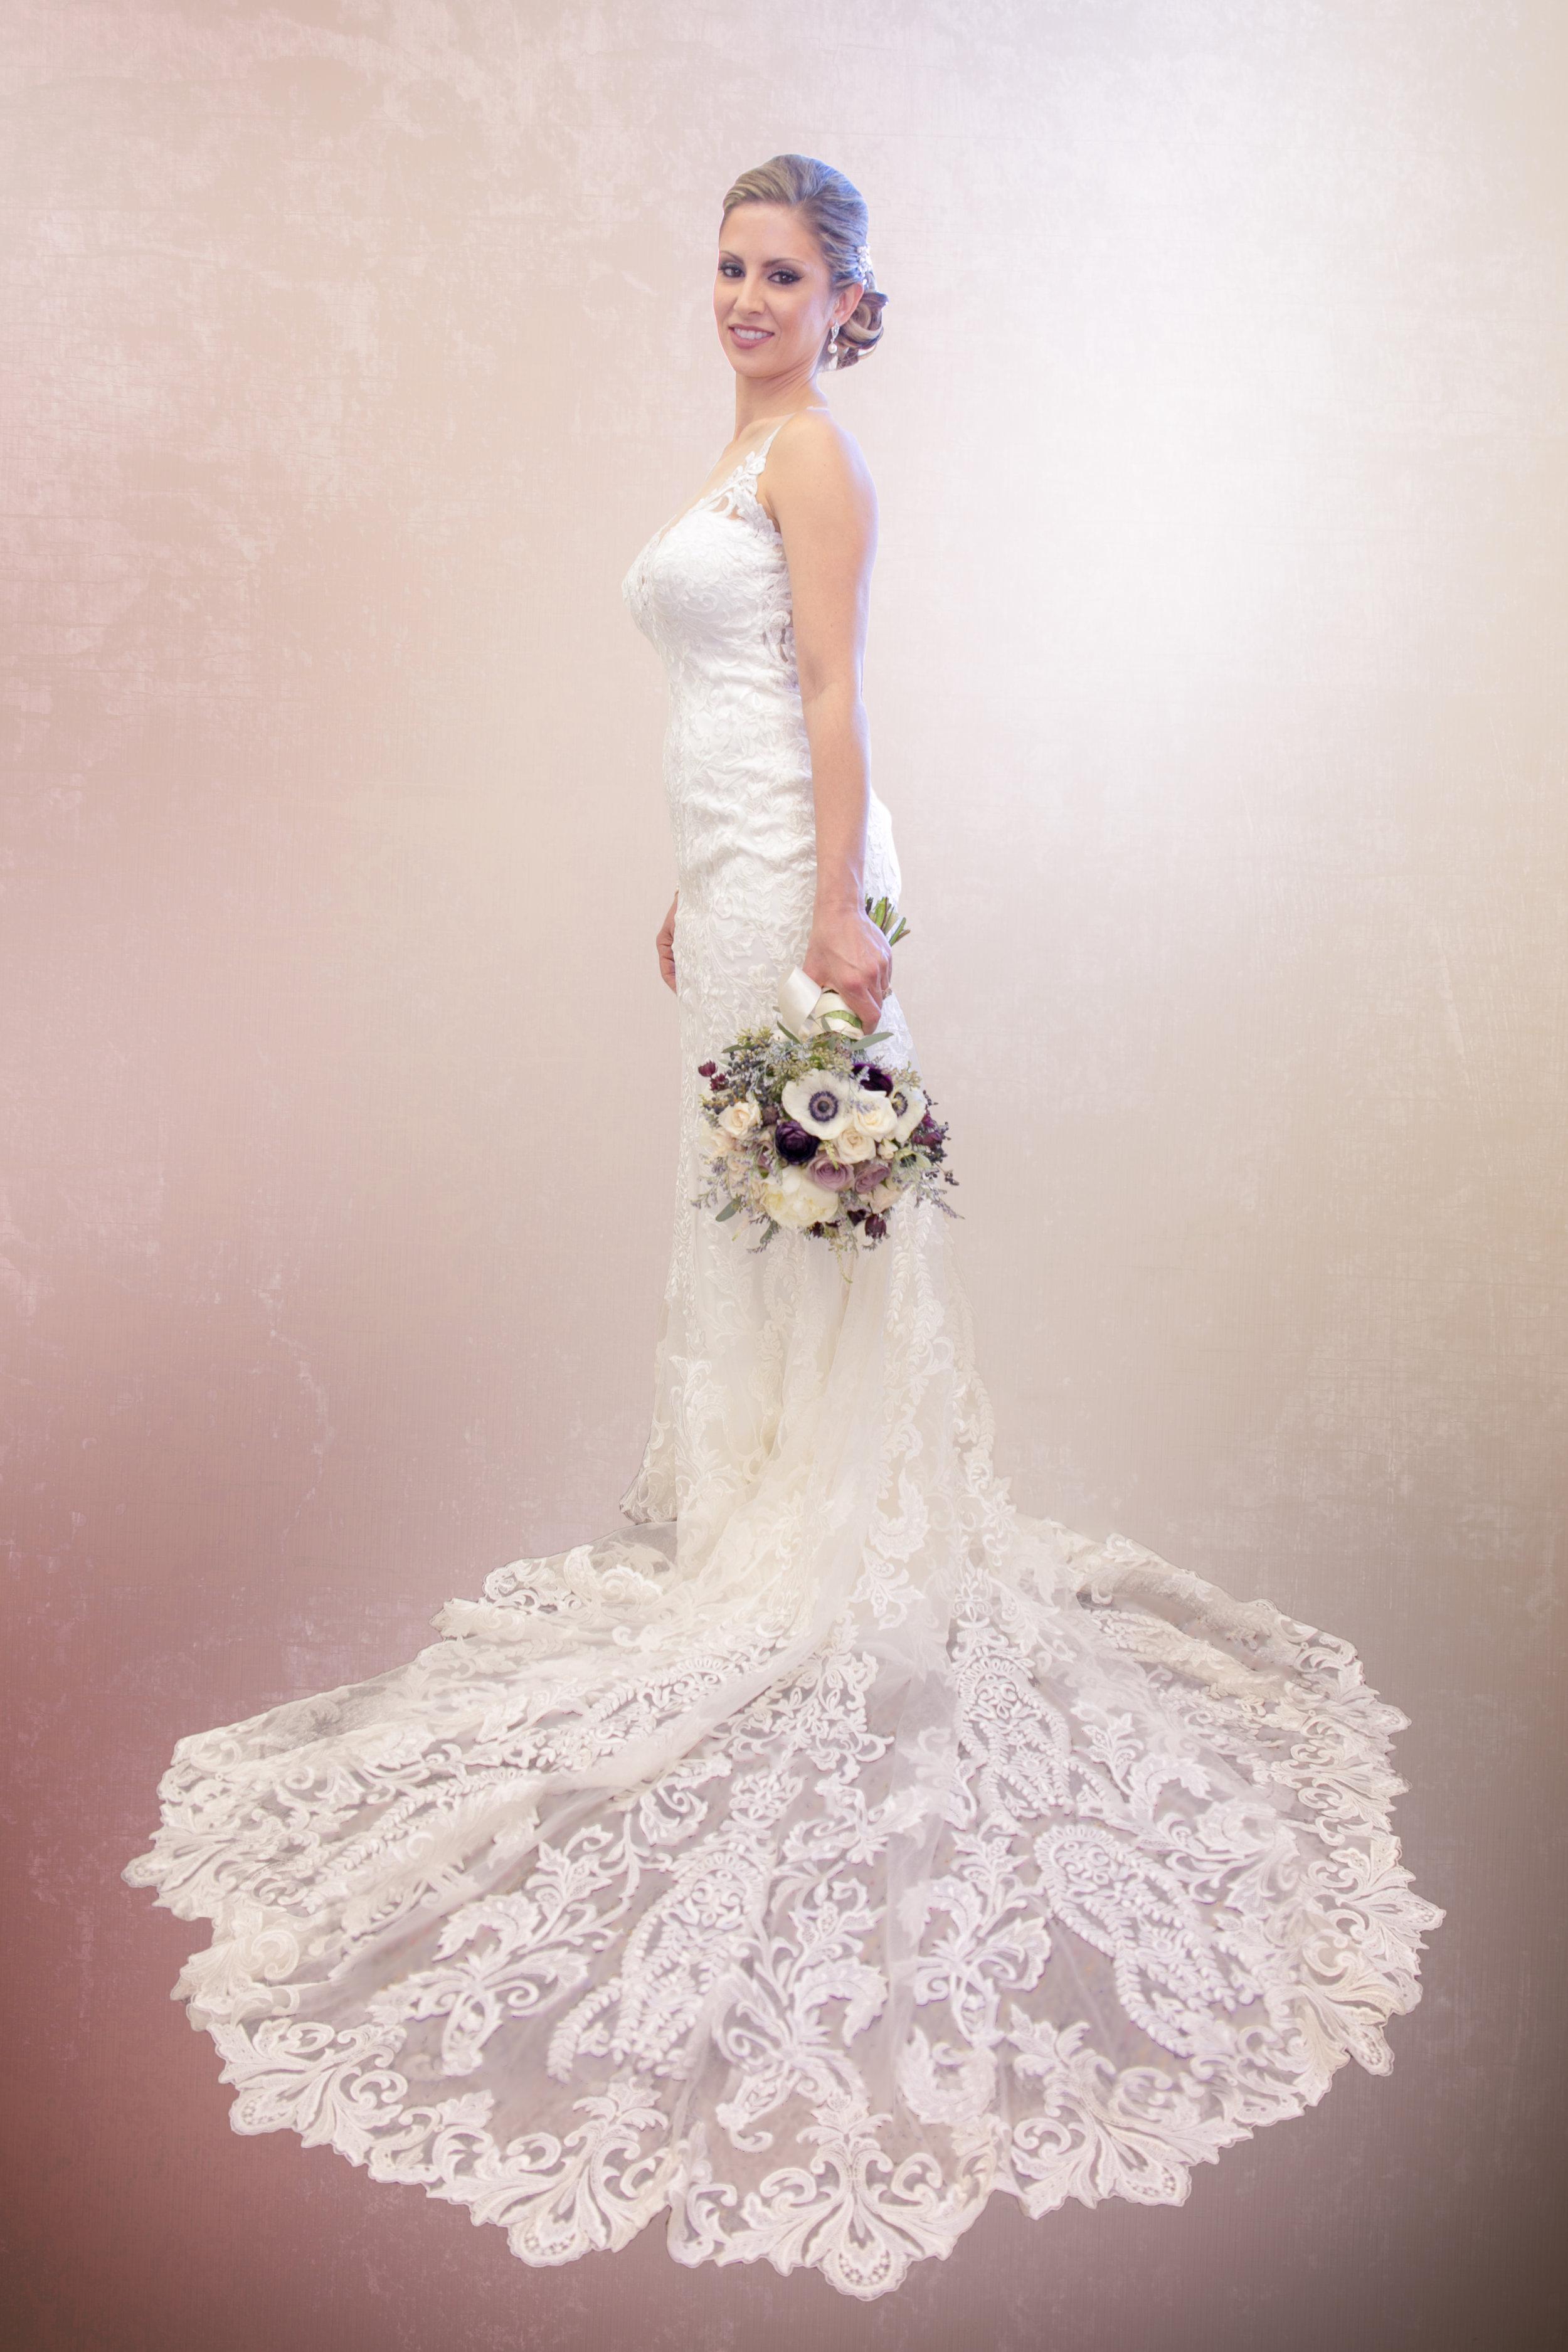 Nashville_Wedding_Photographers_DJ_Lighting_Bowling_Franklin (95 of 120).jpg